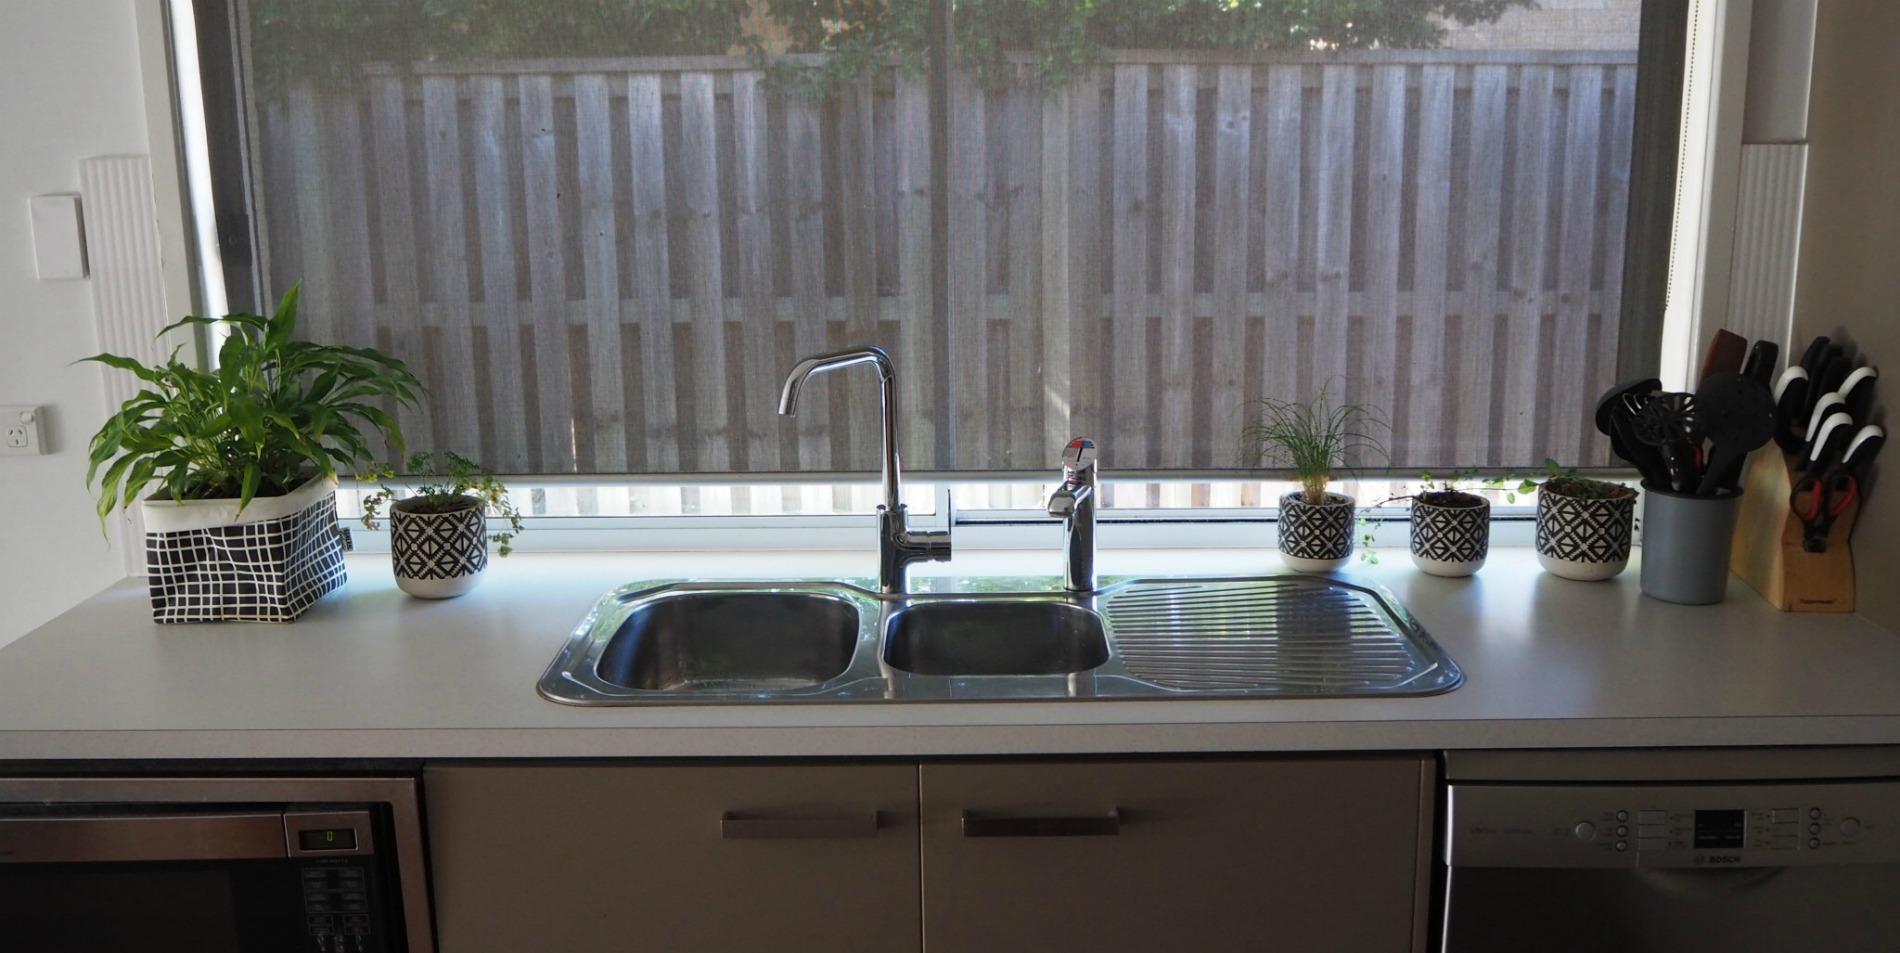 We Got a New Mixer Tap – Plumbing Considerations When Installing a New Kitchen Mixer